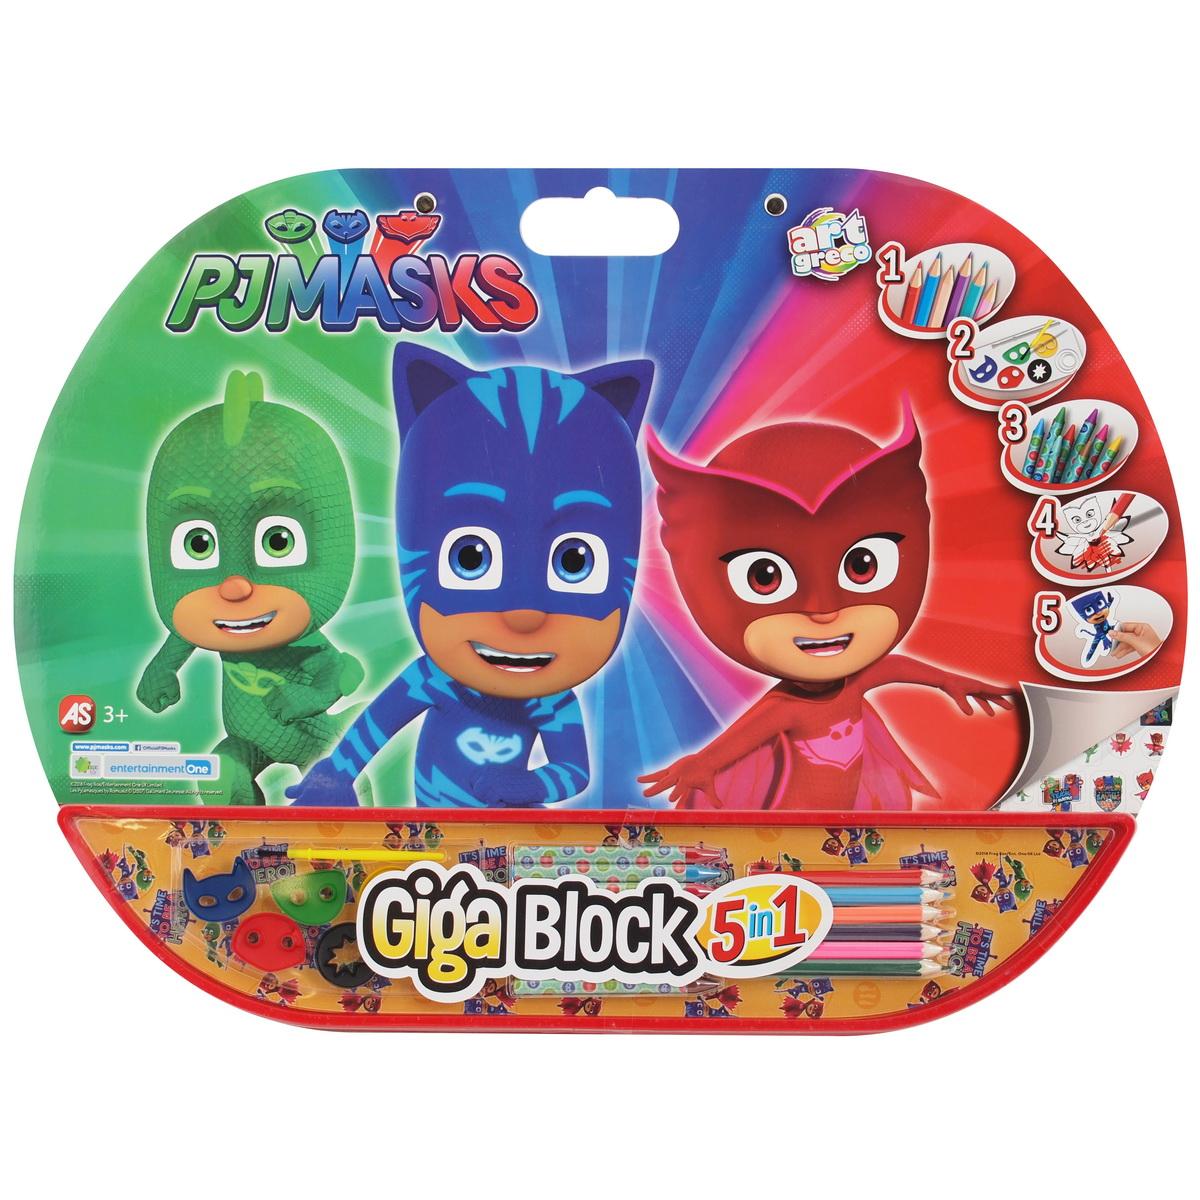 Set Pentru Desen 5in1 Gigablock Eroi In Pijamale